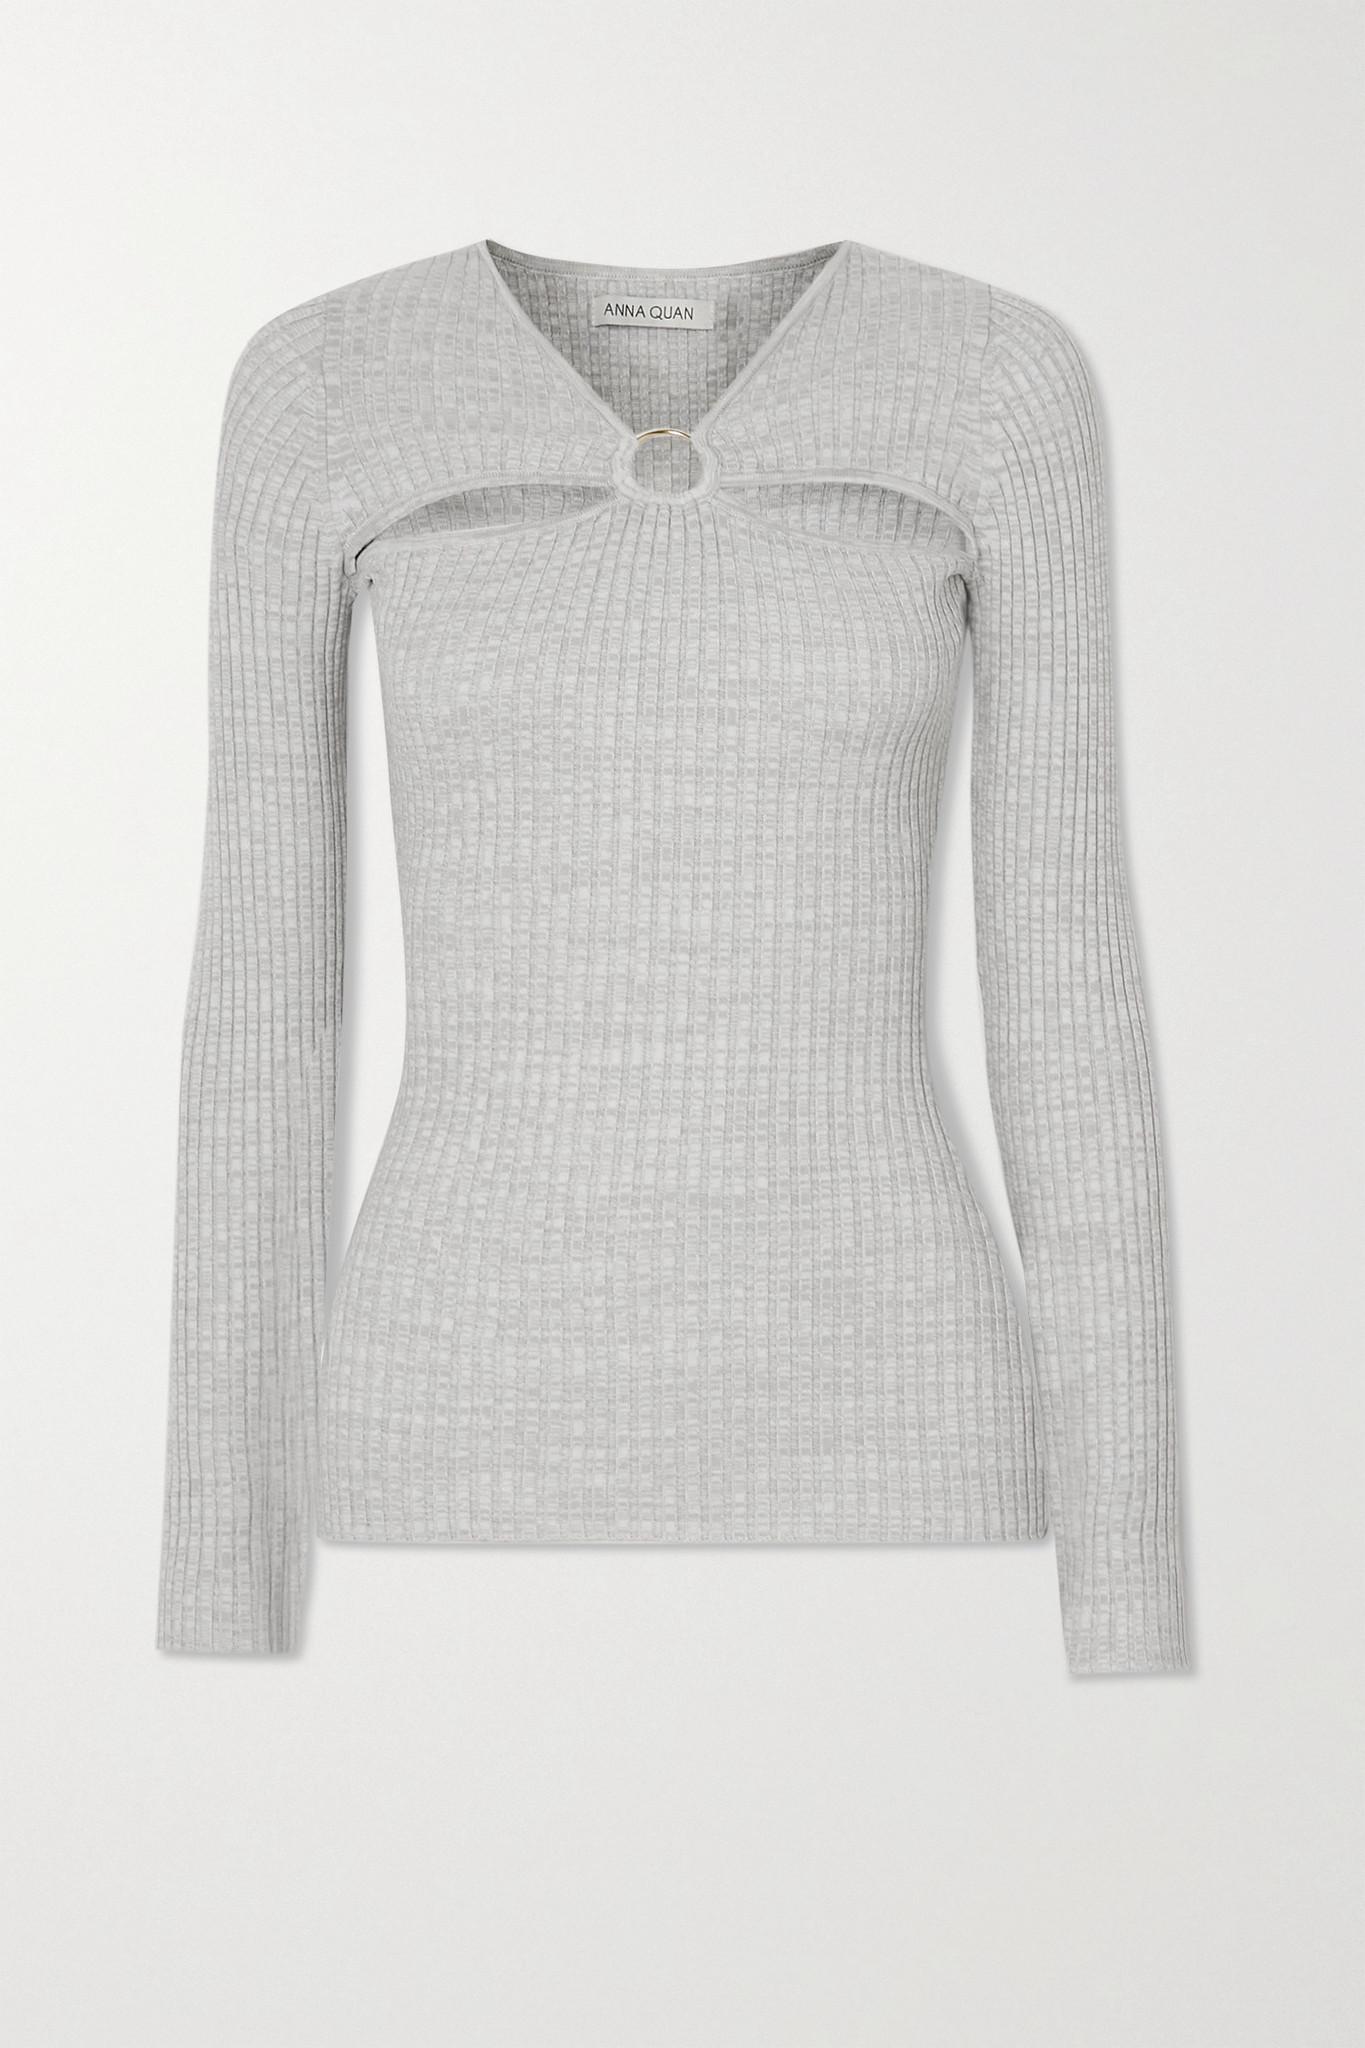 ANNA QUAN - Laila 挖剪带缀饰罗纹纯棉平纹布上衣 - 灰色 - UK8